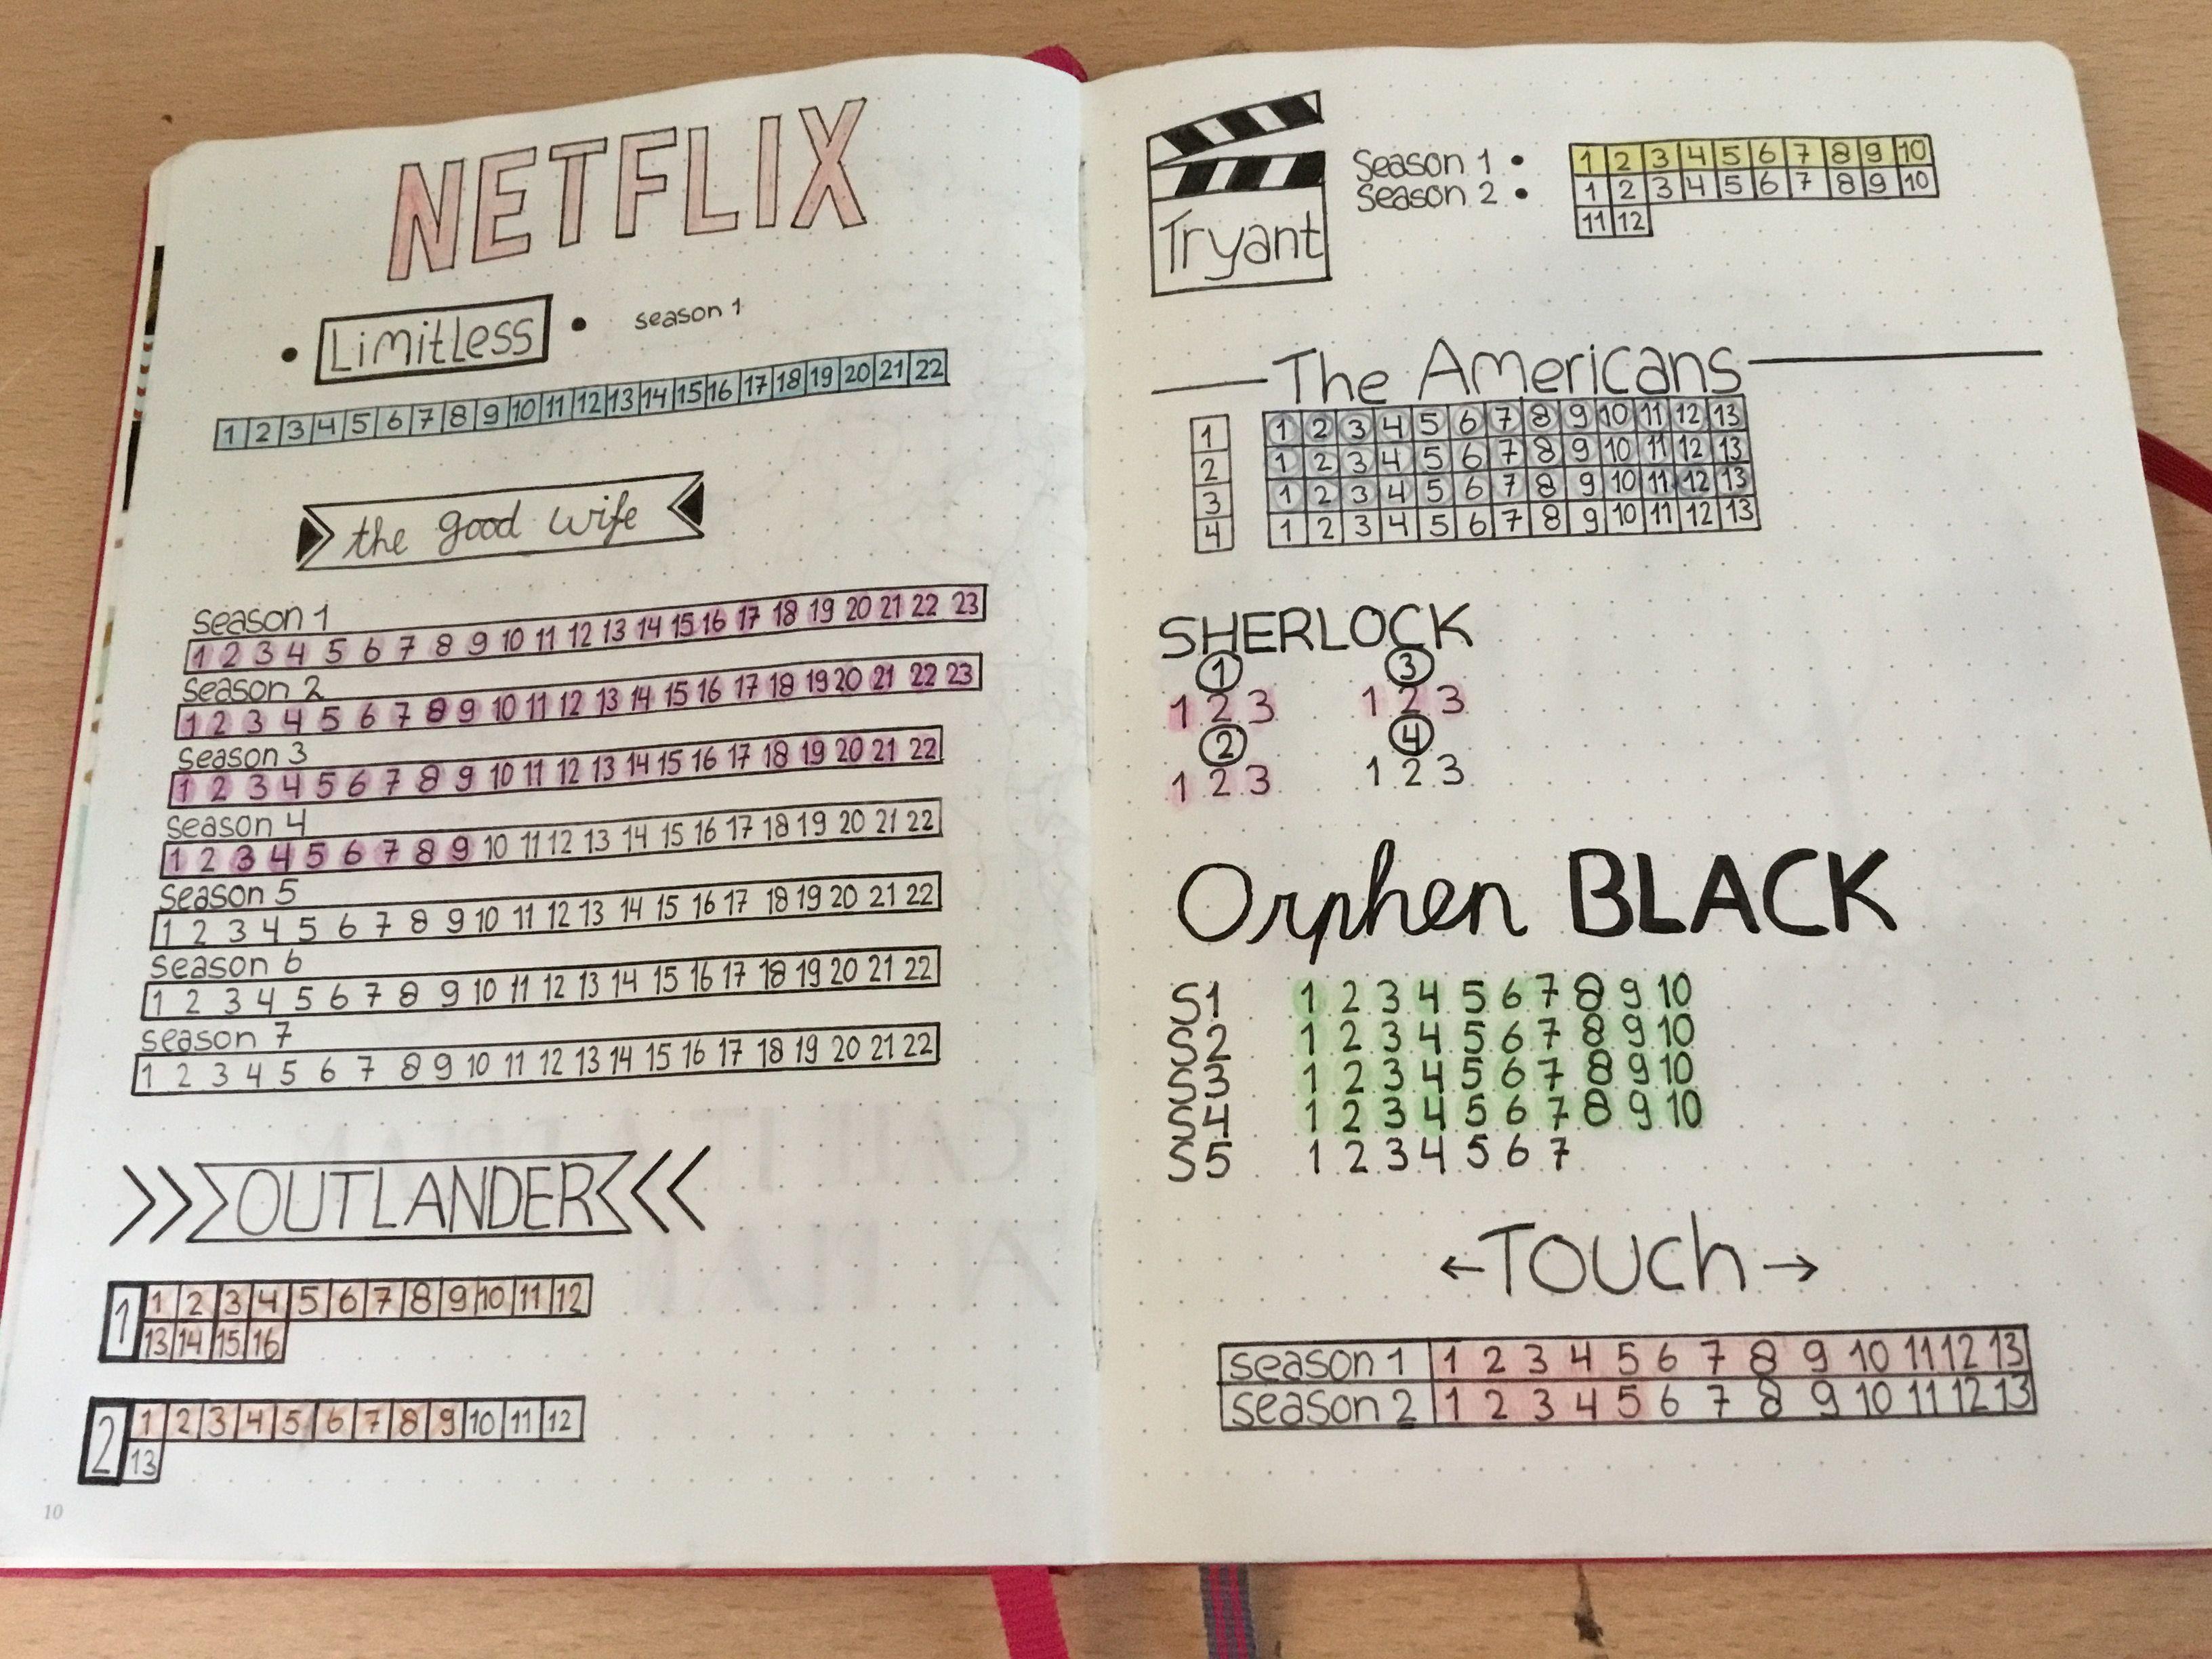 bullet journal series tracker netflix bullet journal pinterest. Black Bedroom Furniture Sets. Home Design Ideas